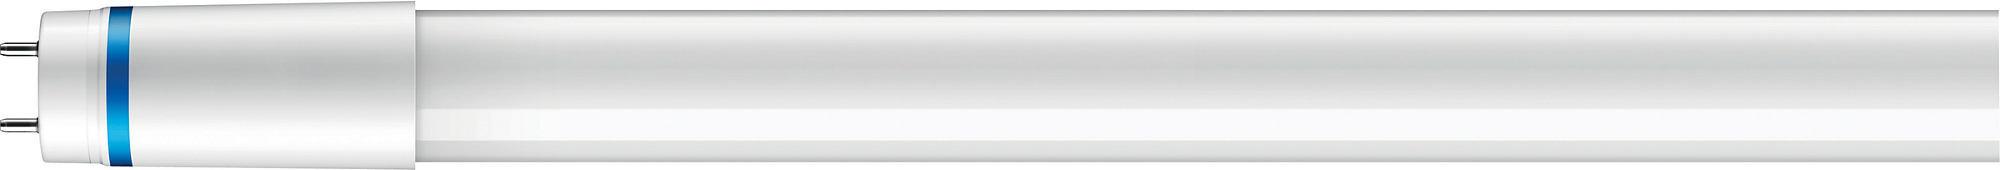 Philips MASTER LEDtube Value 1200mm HO 20W 830 C ROT